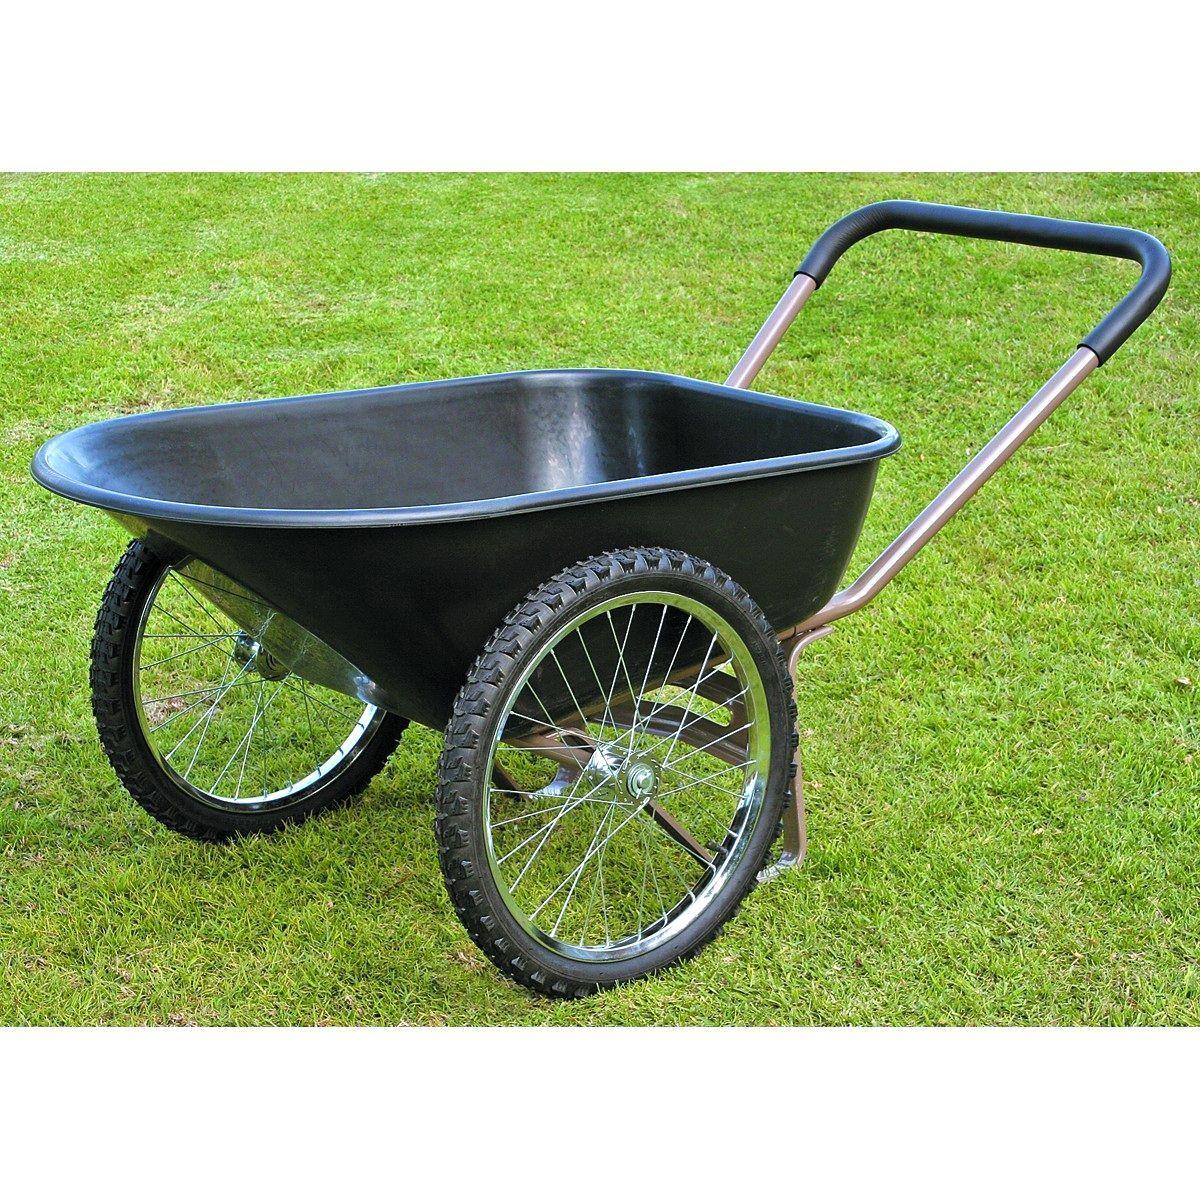 How To Build A Garden Cart Using Bicycle Wheels Garden Cart